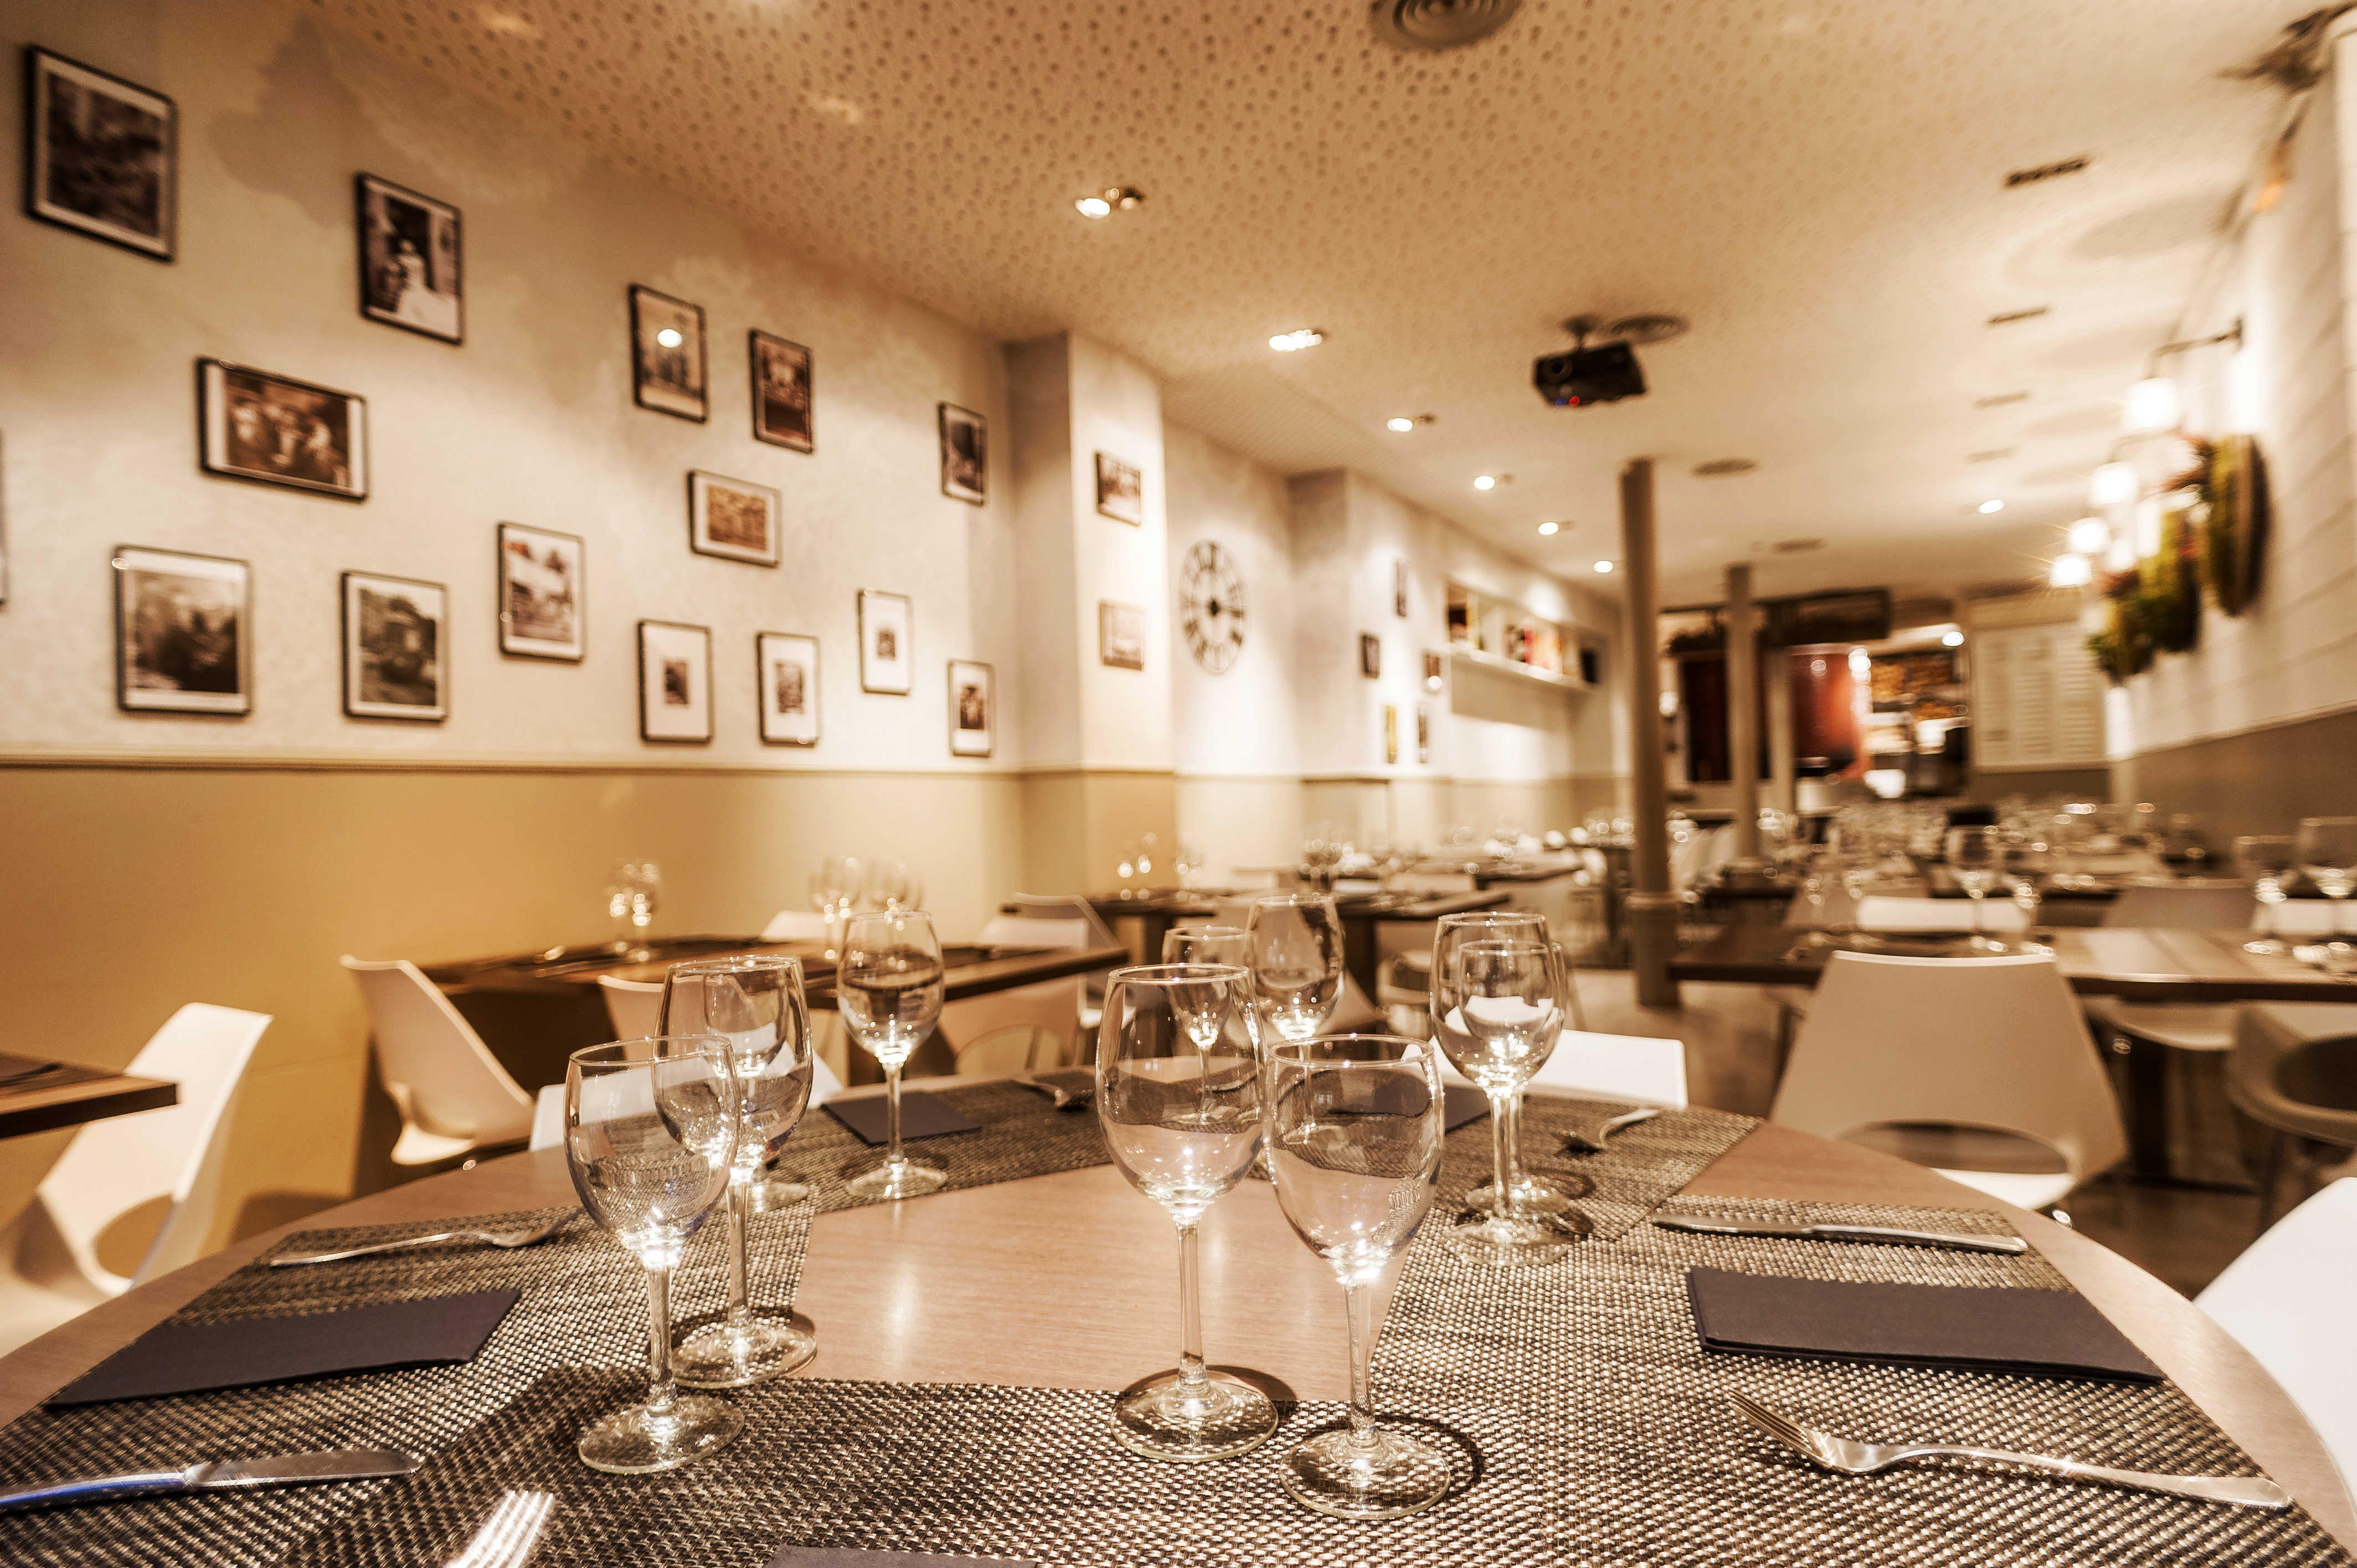 Murivecchi restaurant dining room